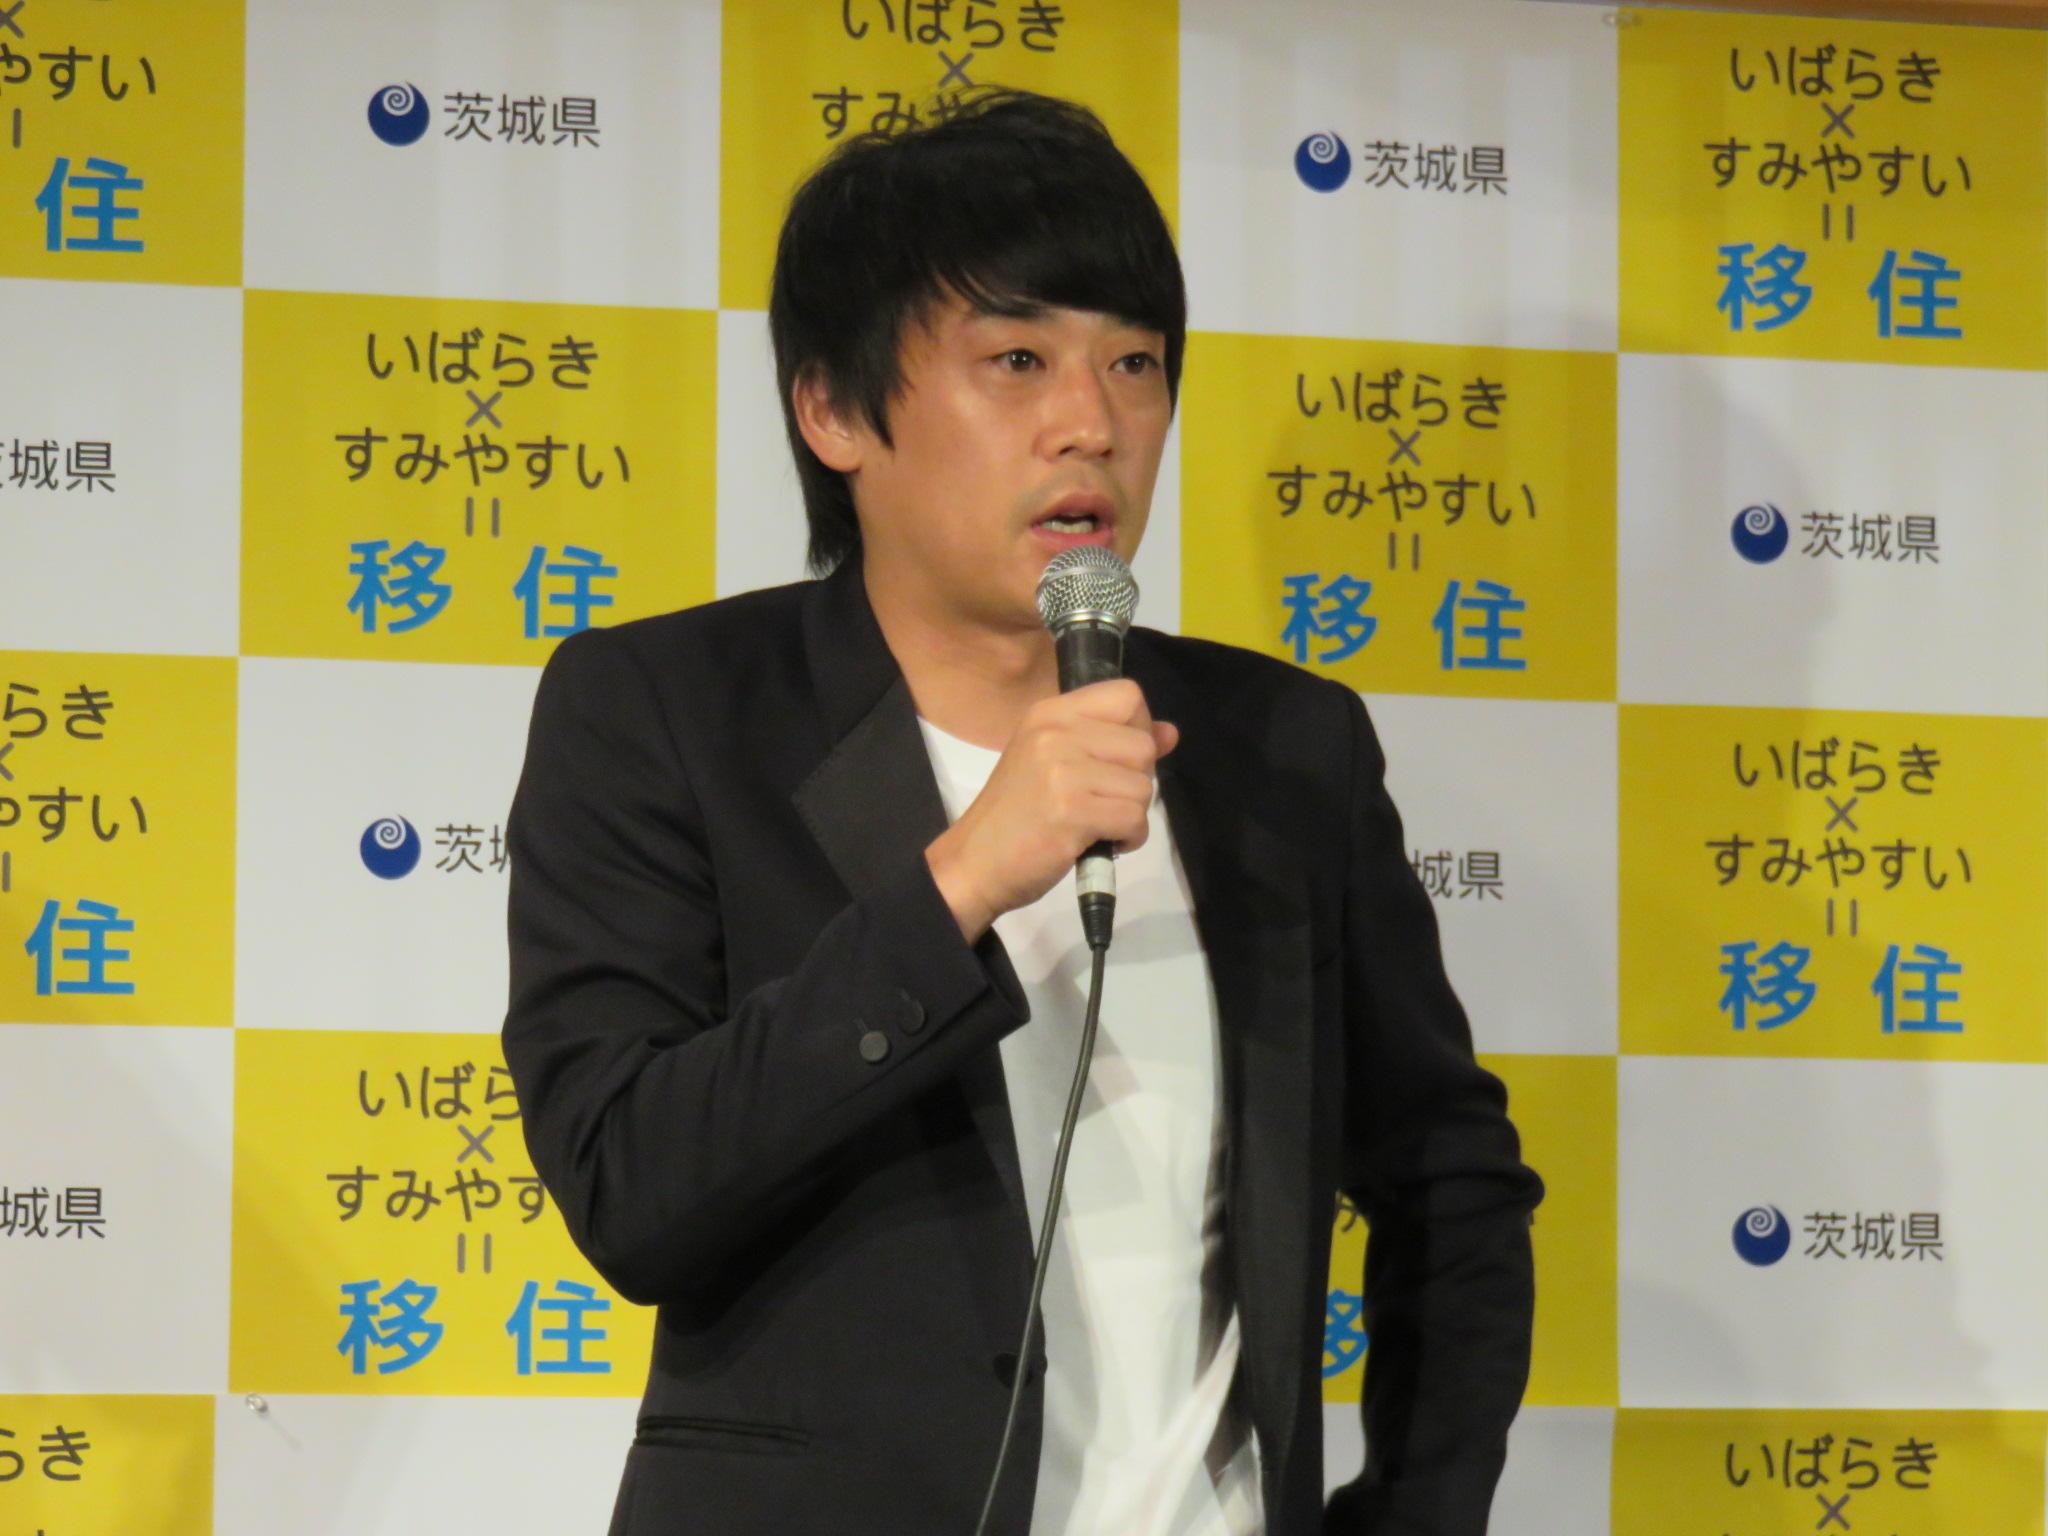 http://news.yoshimoto.co.jp/20160630165226-9641c8b6d6544d3d2538bbff3757a109031282c5.jpg